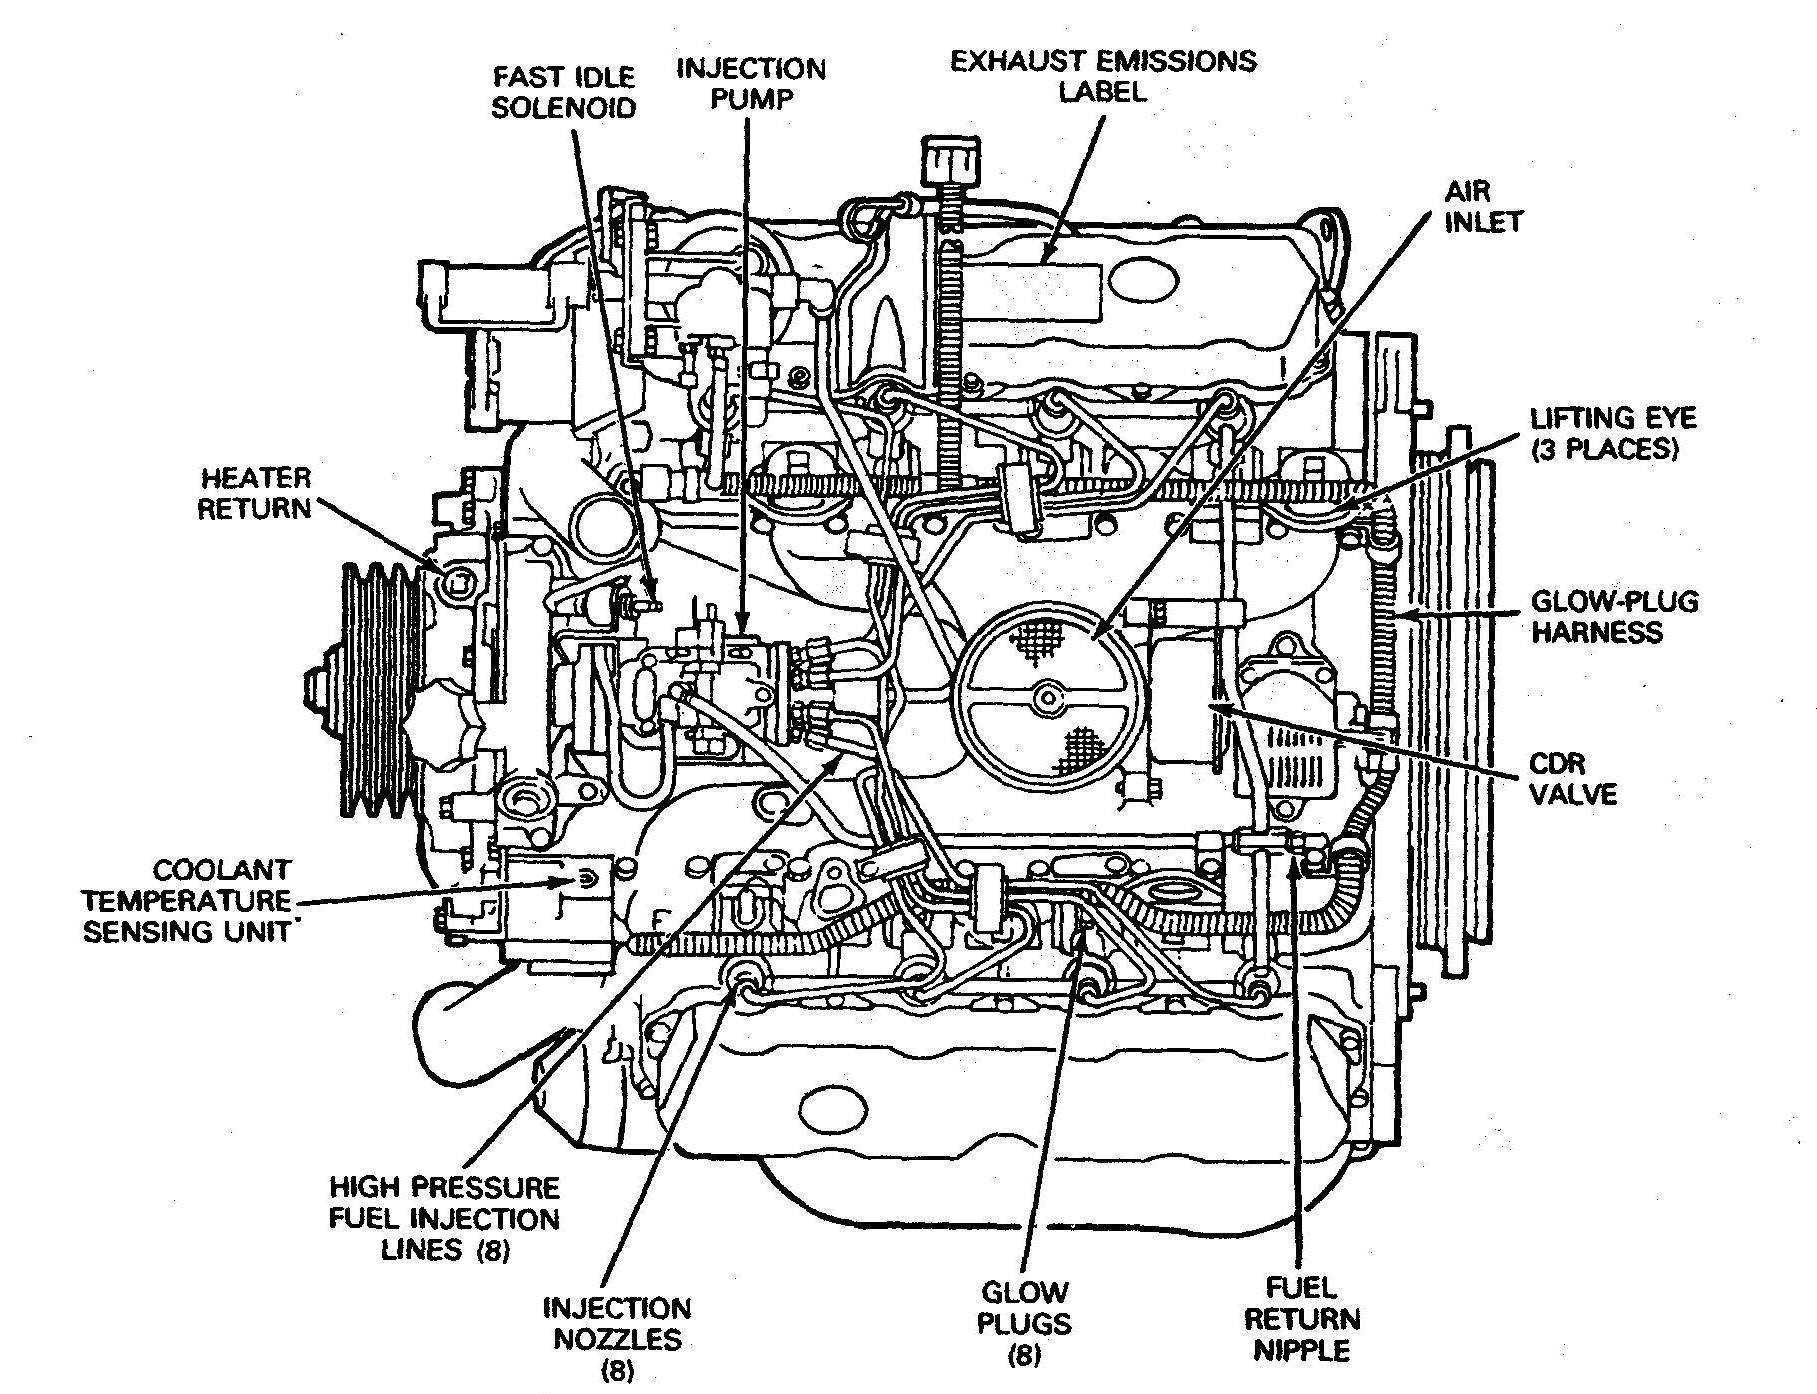 Diagram Of Car Parts Automotive Engine Diagram Wiring Diagrams Of Diagram Of Car Parts